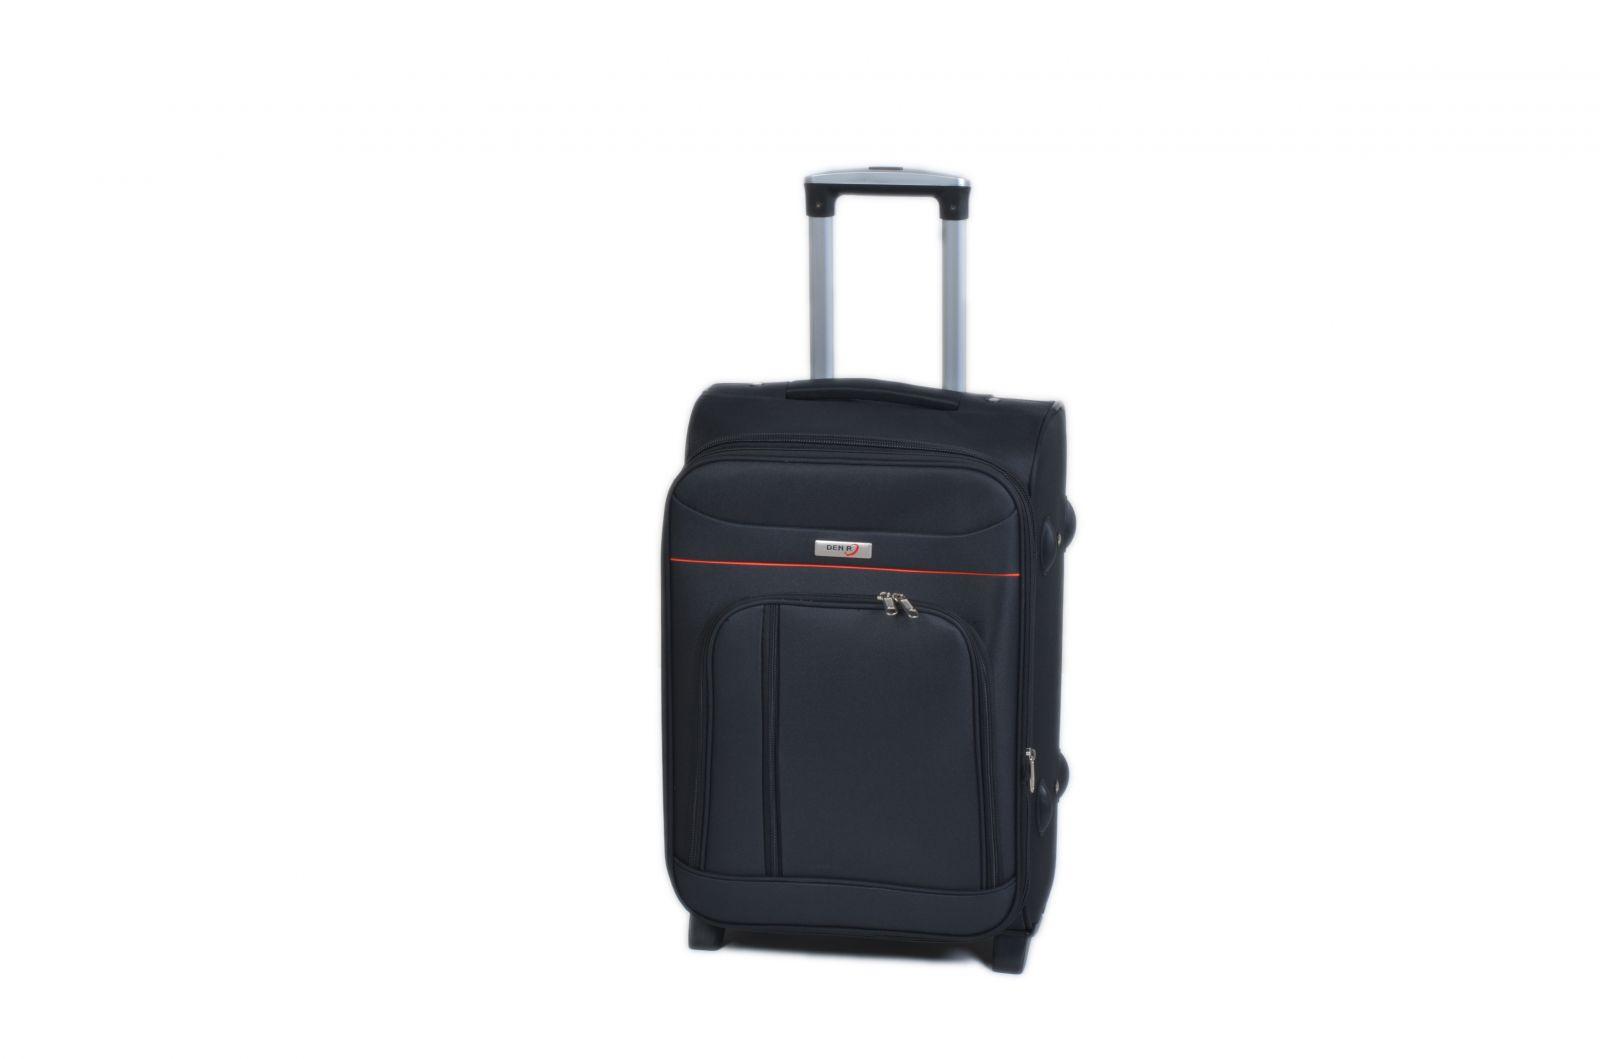 Trolley-CASE TC-B887 malý černý E-batoh